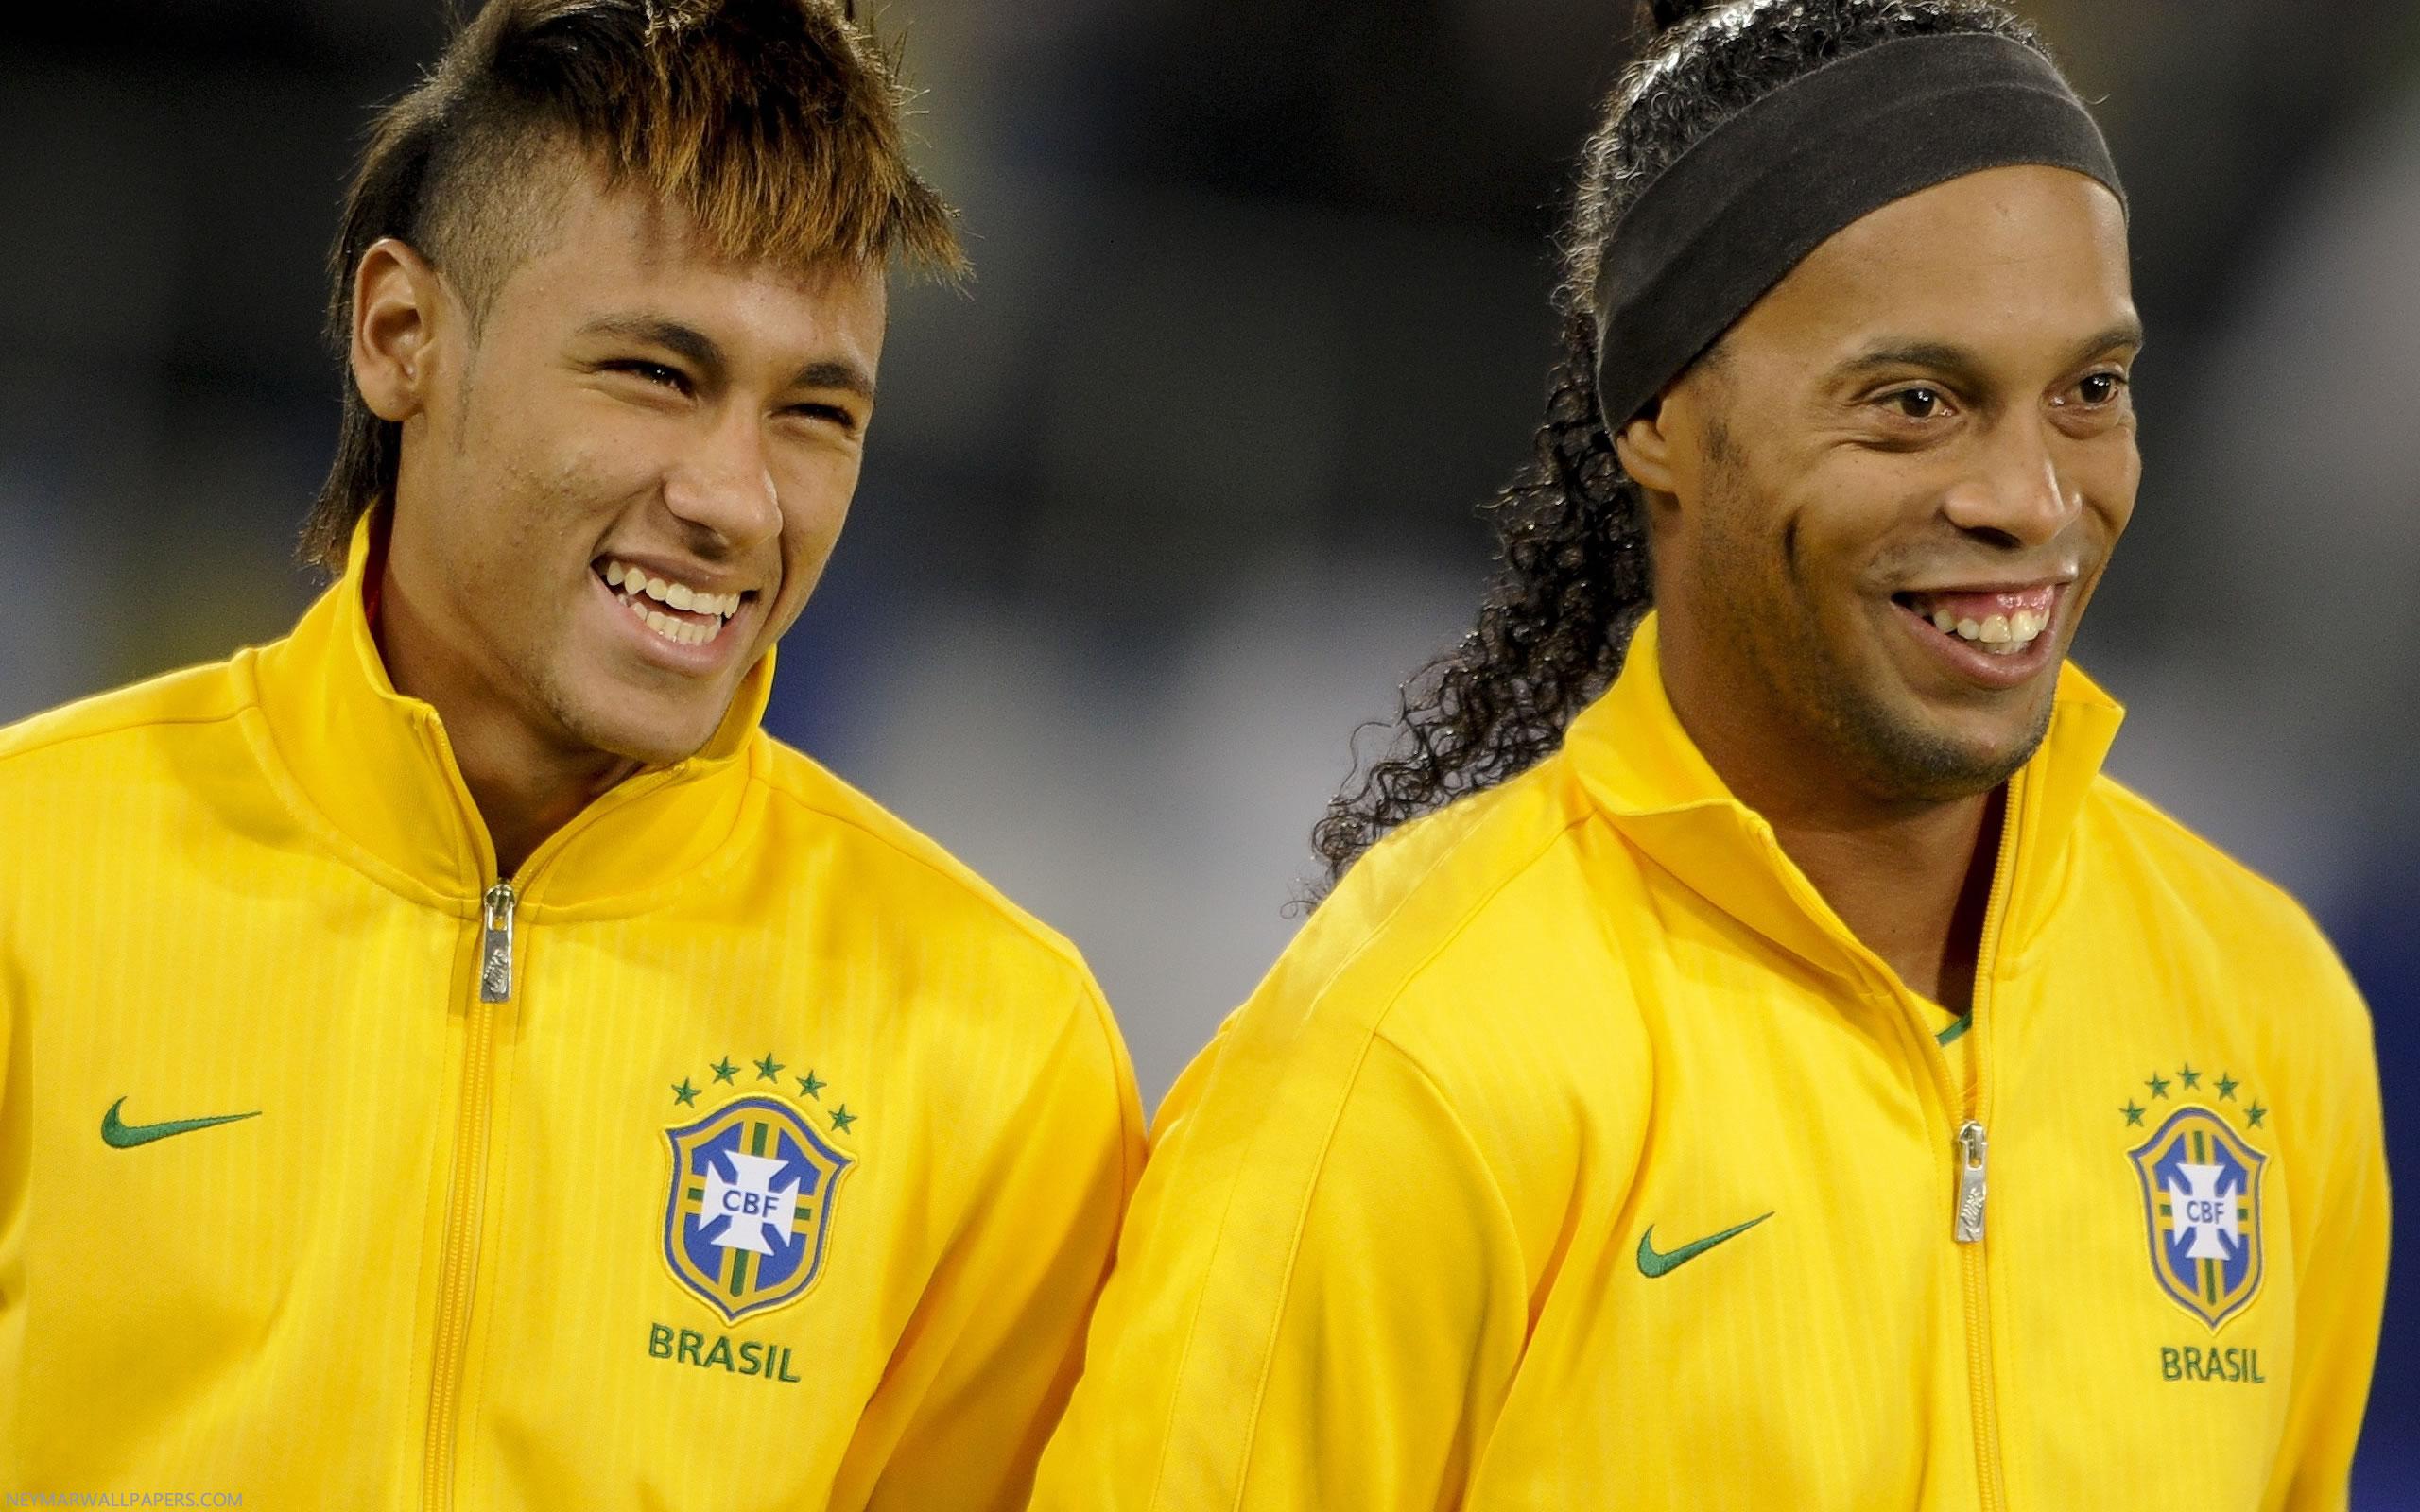 Neymar And Ronaldinho Neymar Wallpapers